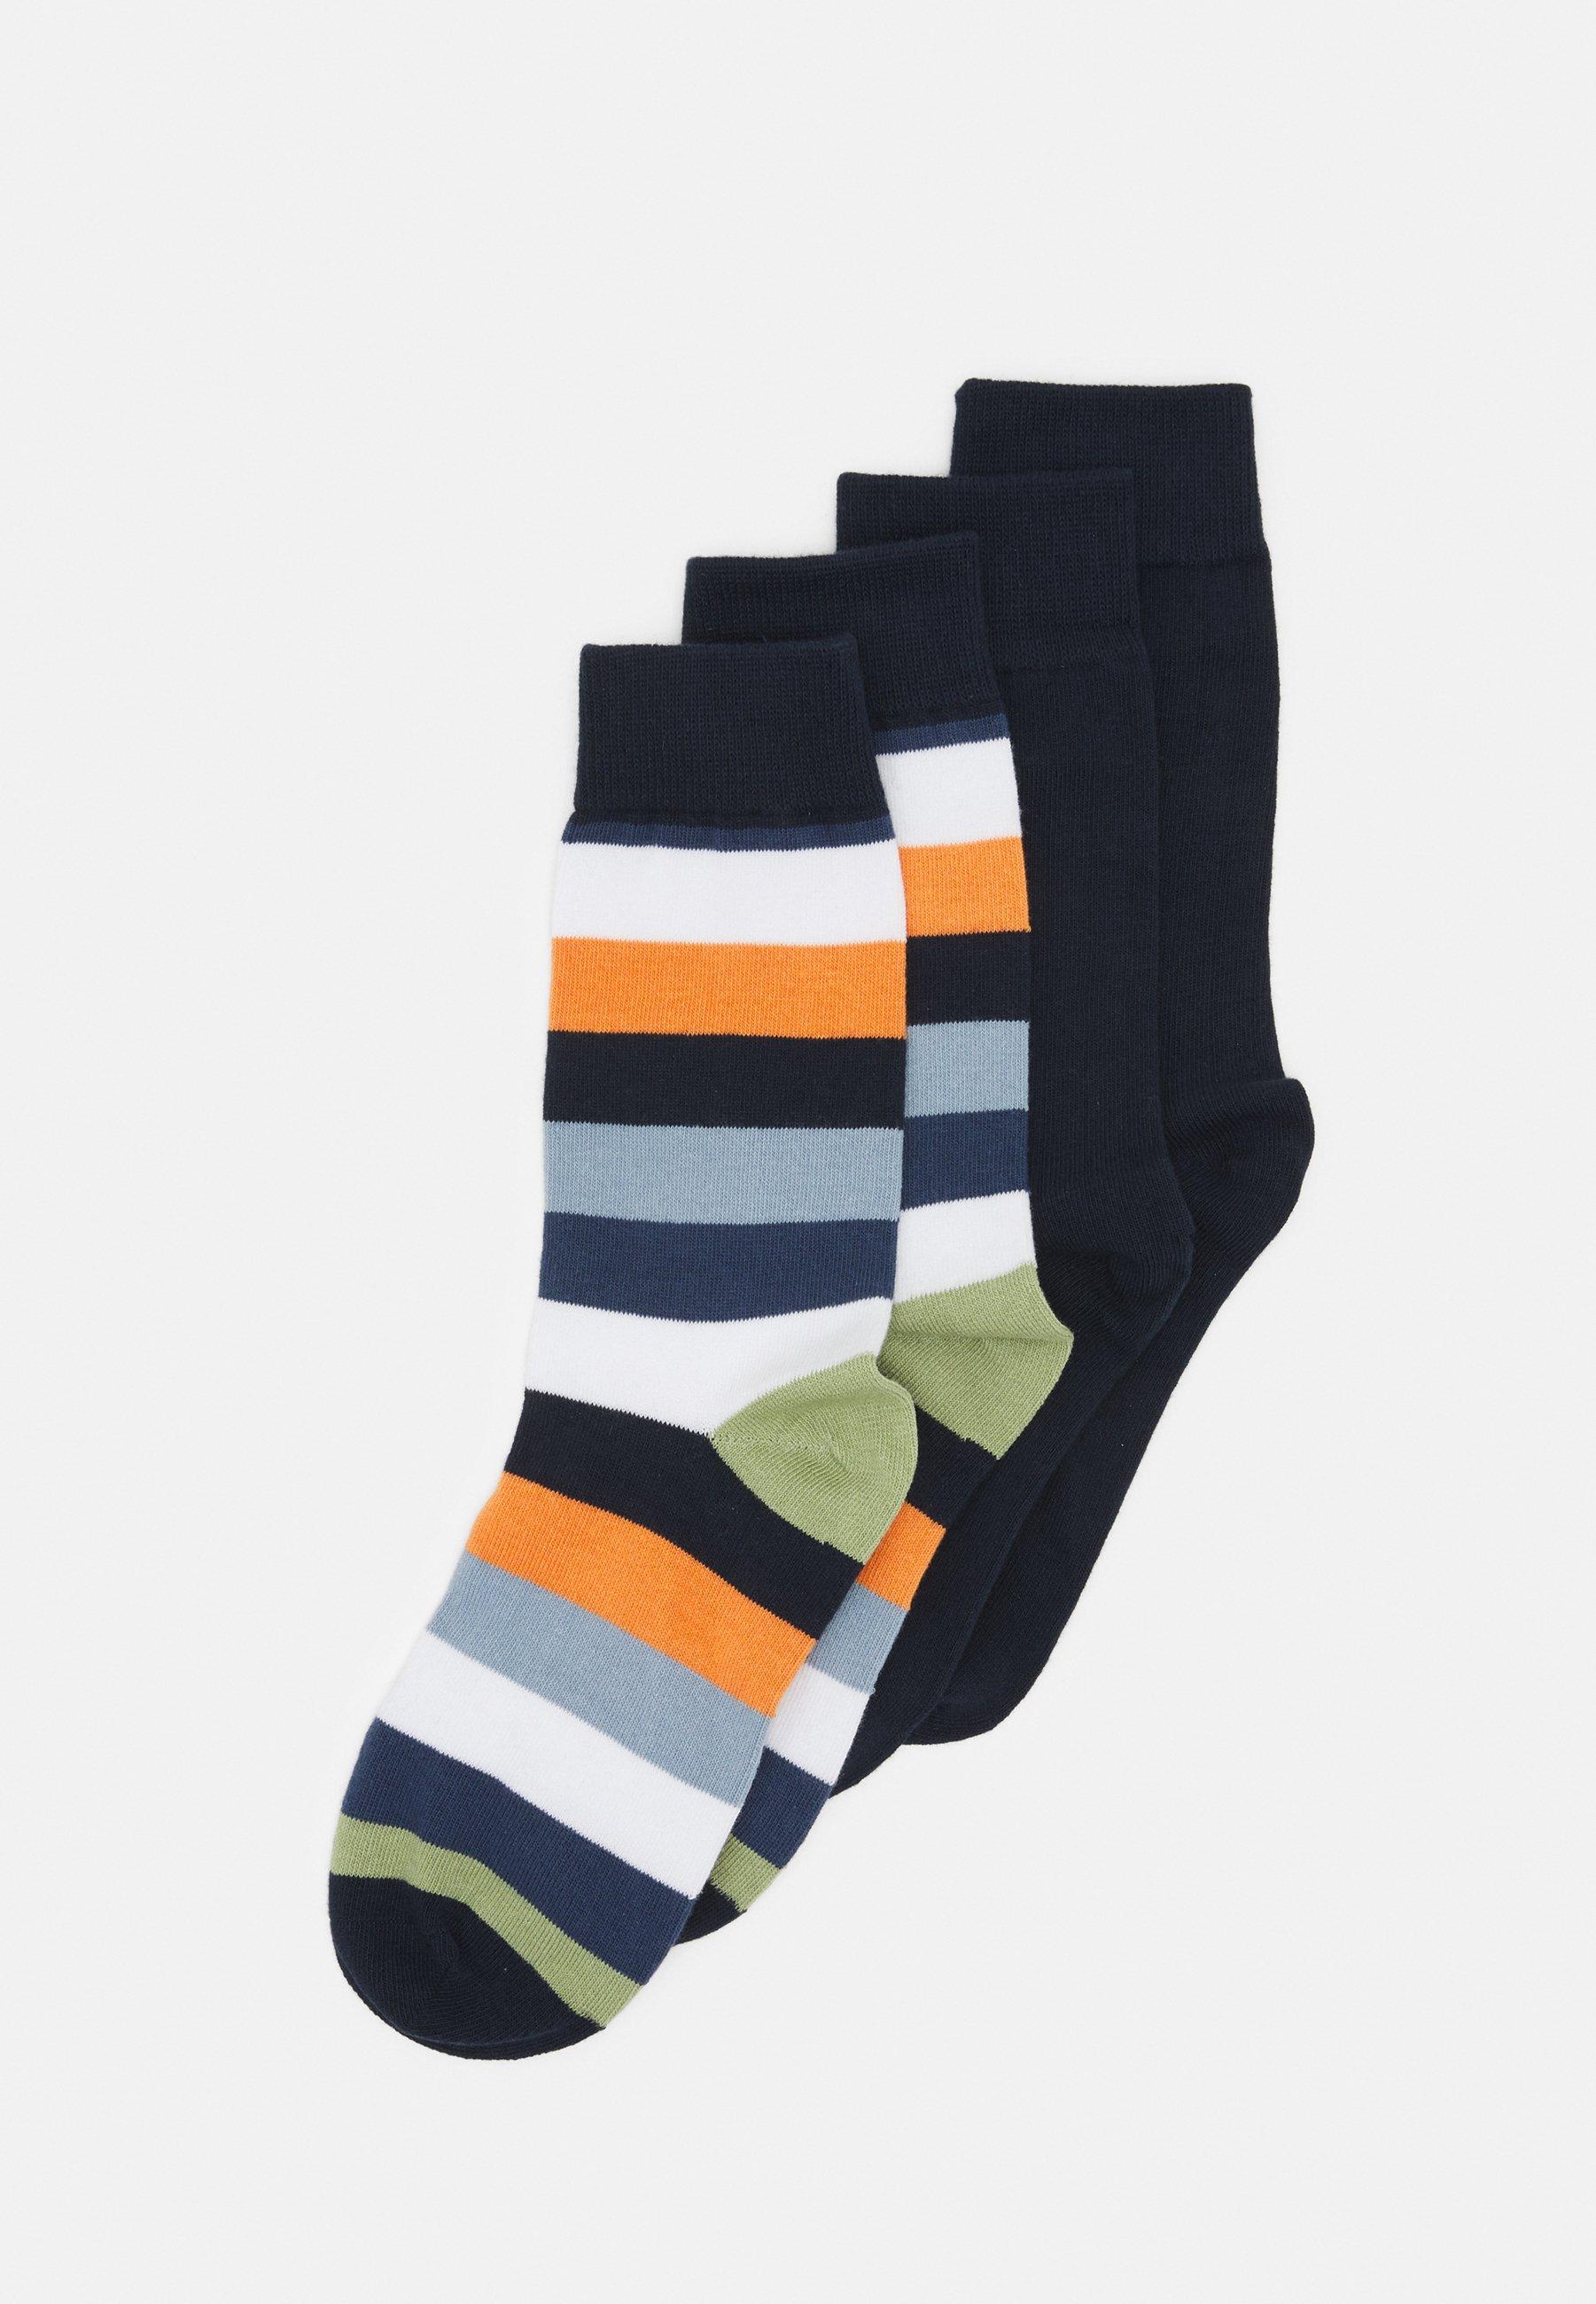 Men TIMBER BLOCK STRIPED SOLID SOCKS VEGAN 4 PACK - Socks